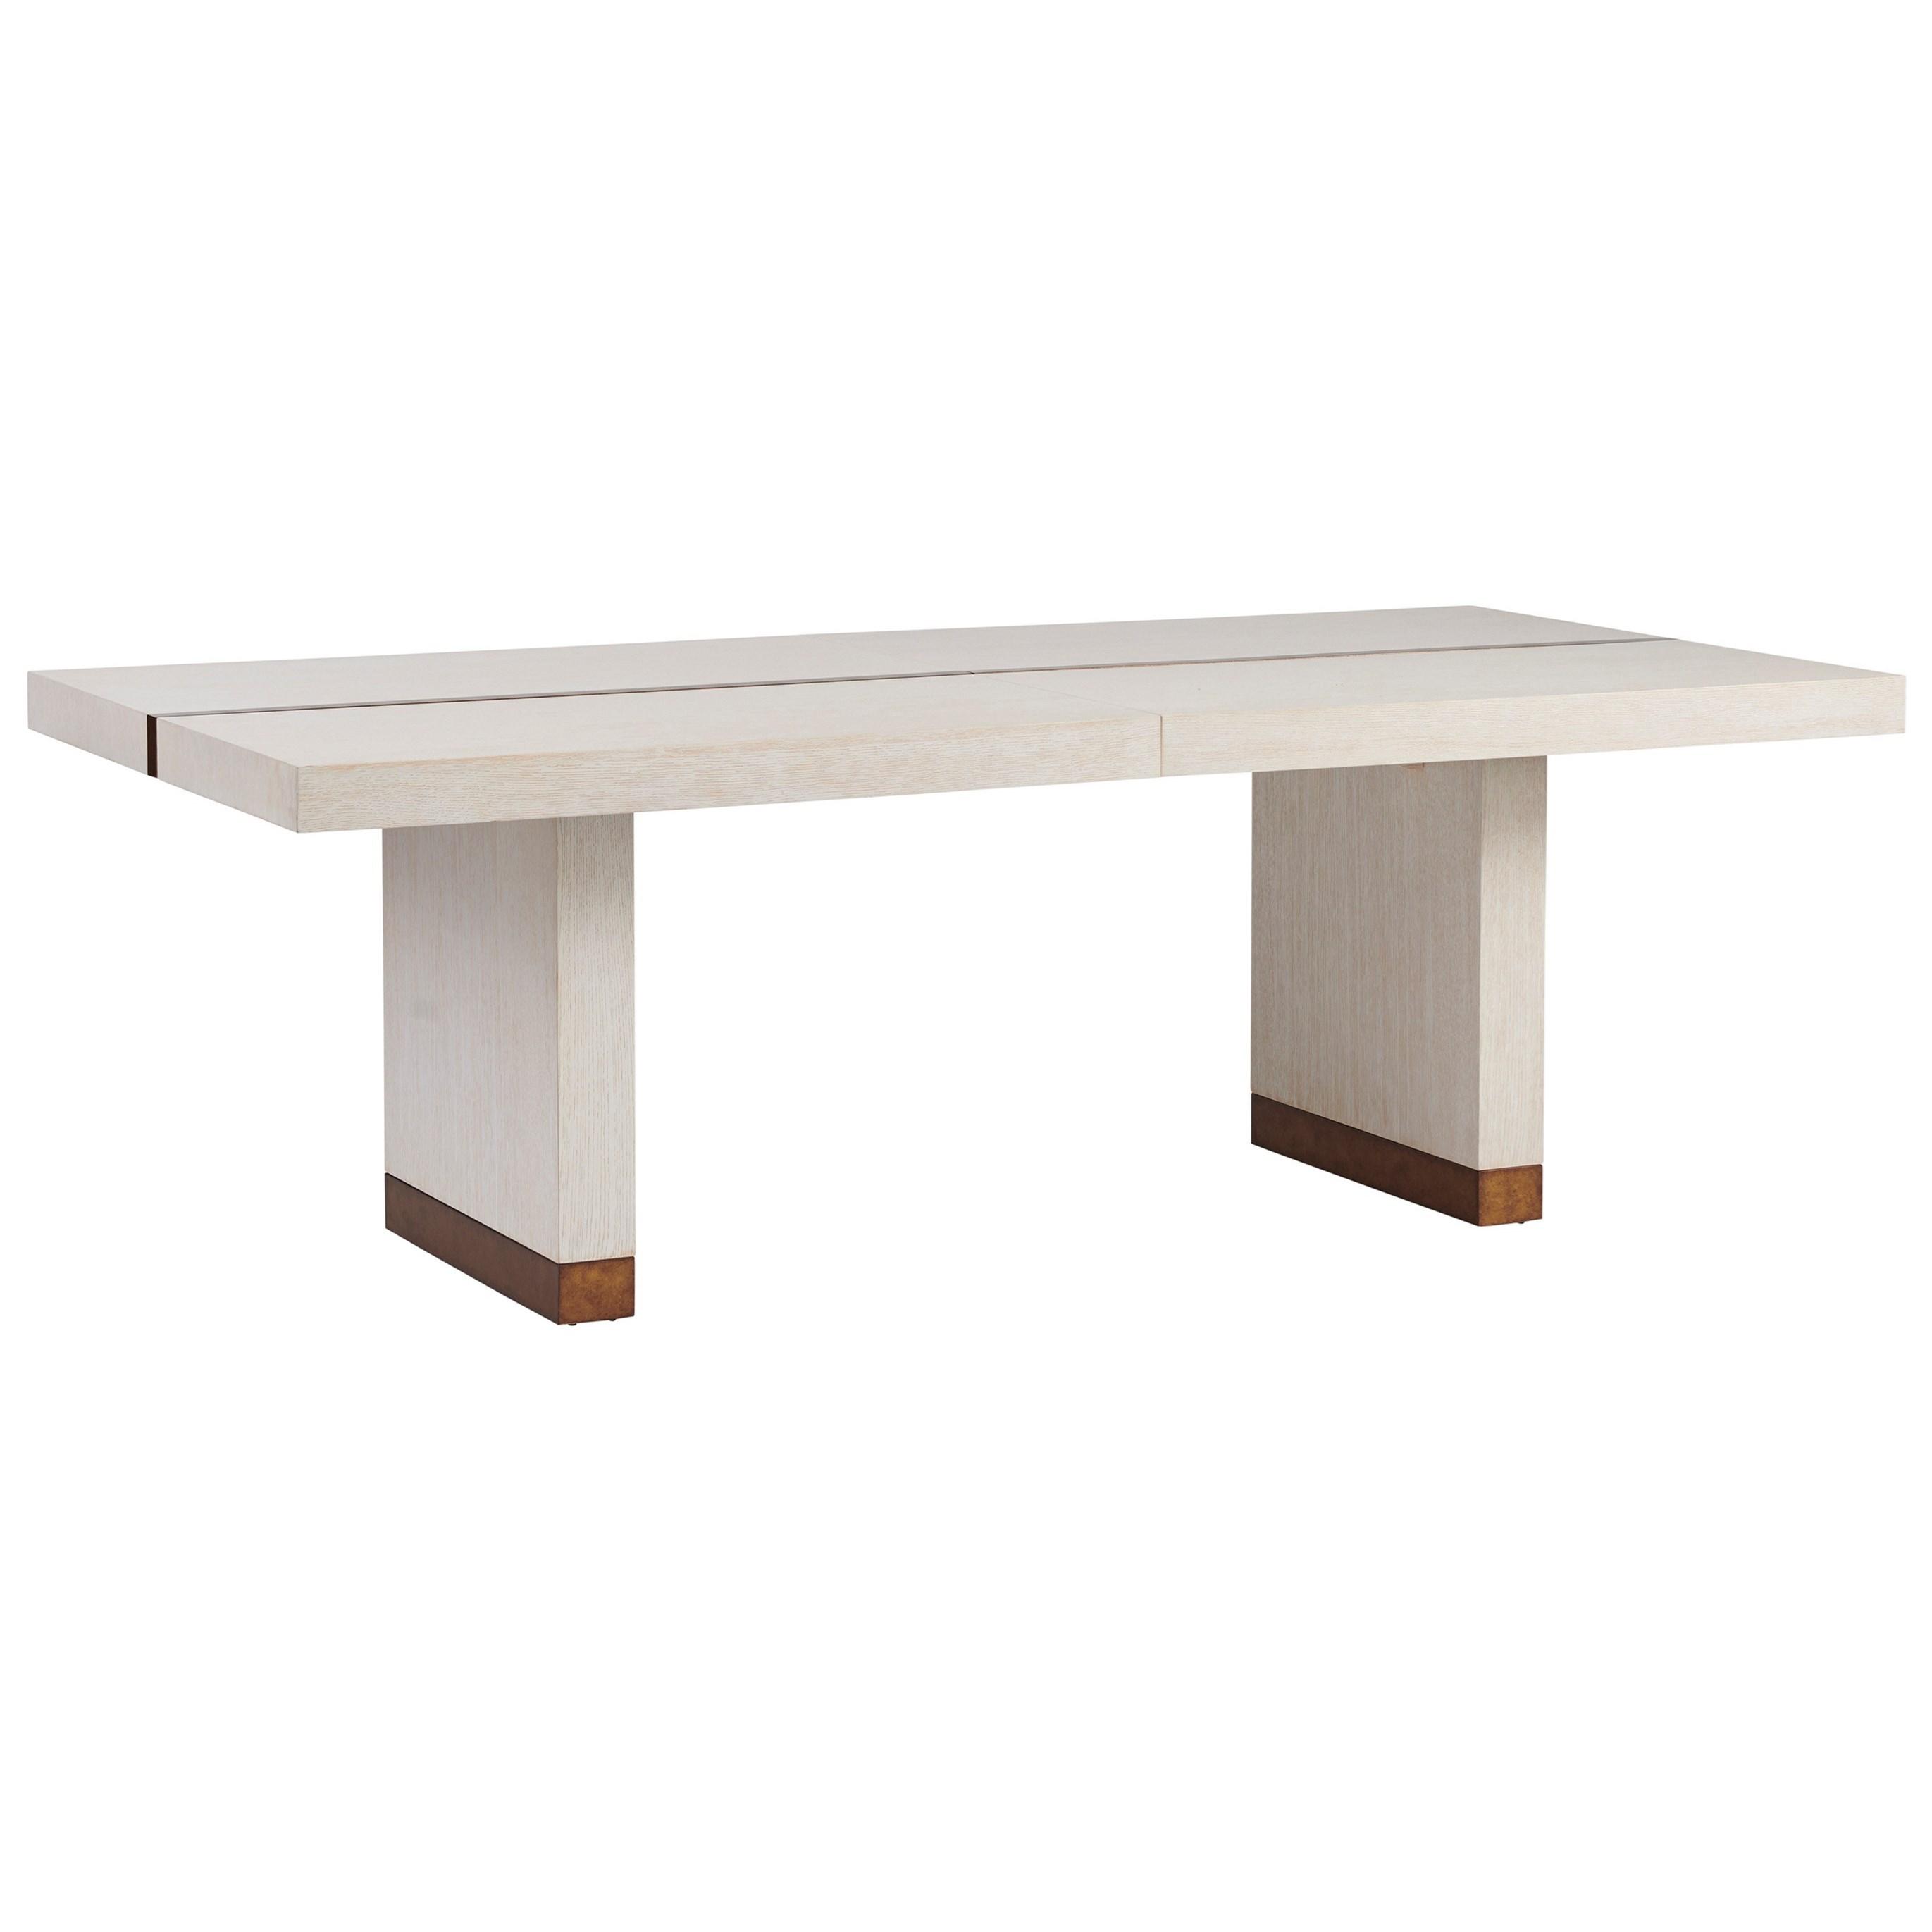 Carmel Vista Rectangular Dining Table by Barclay Butera at Baer's Furniture